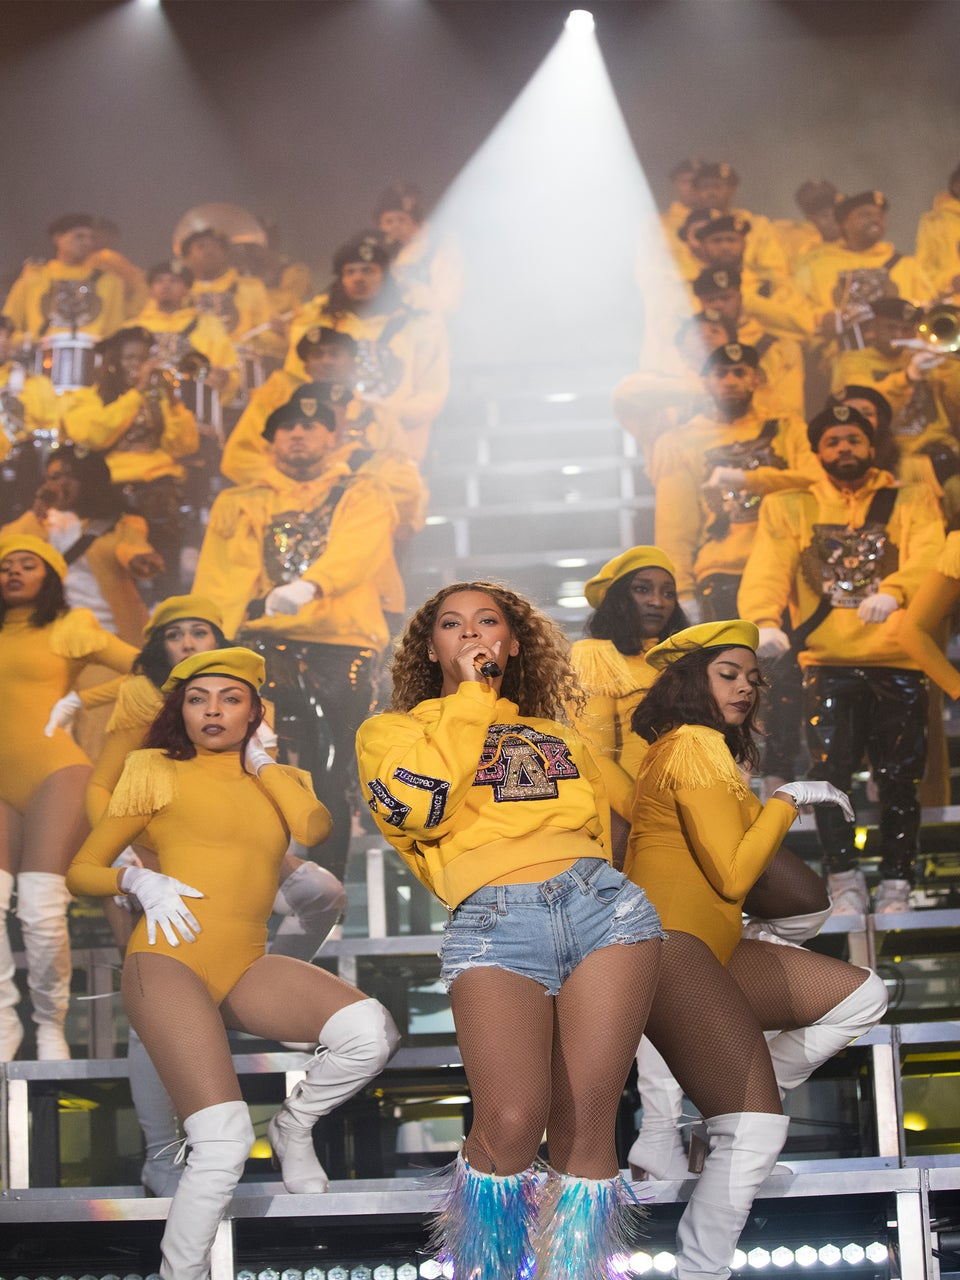 Beyoncé Announces Homecoming Scholars Award Program For Students At Four HBCUs